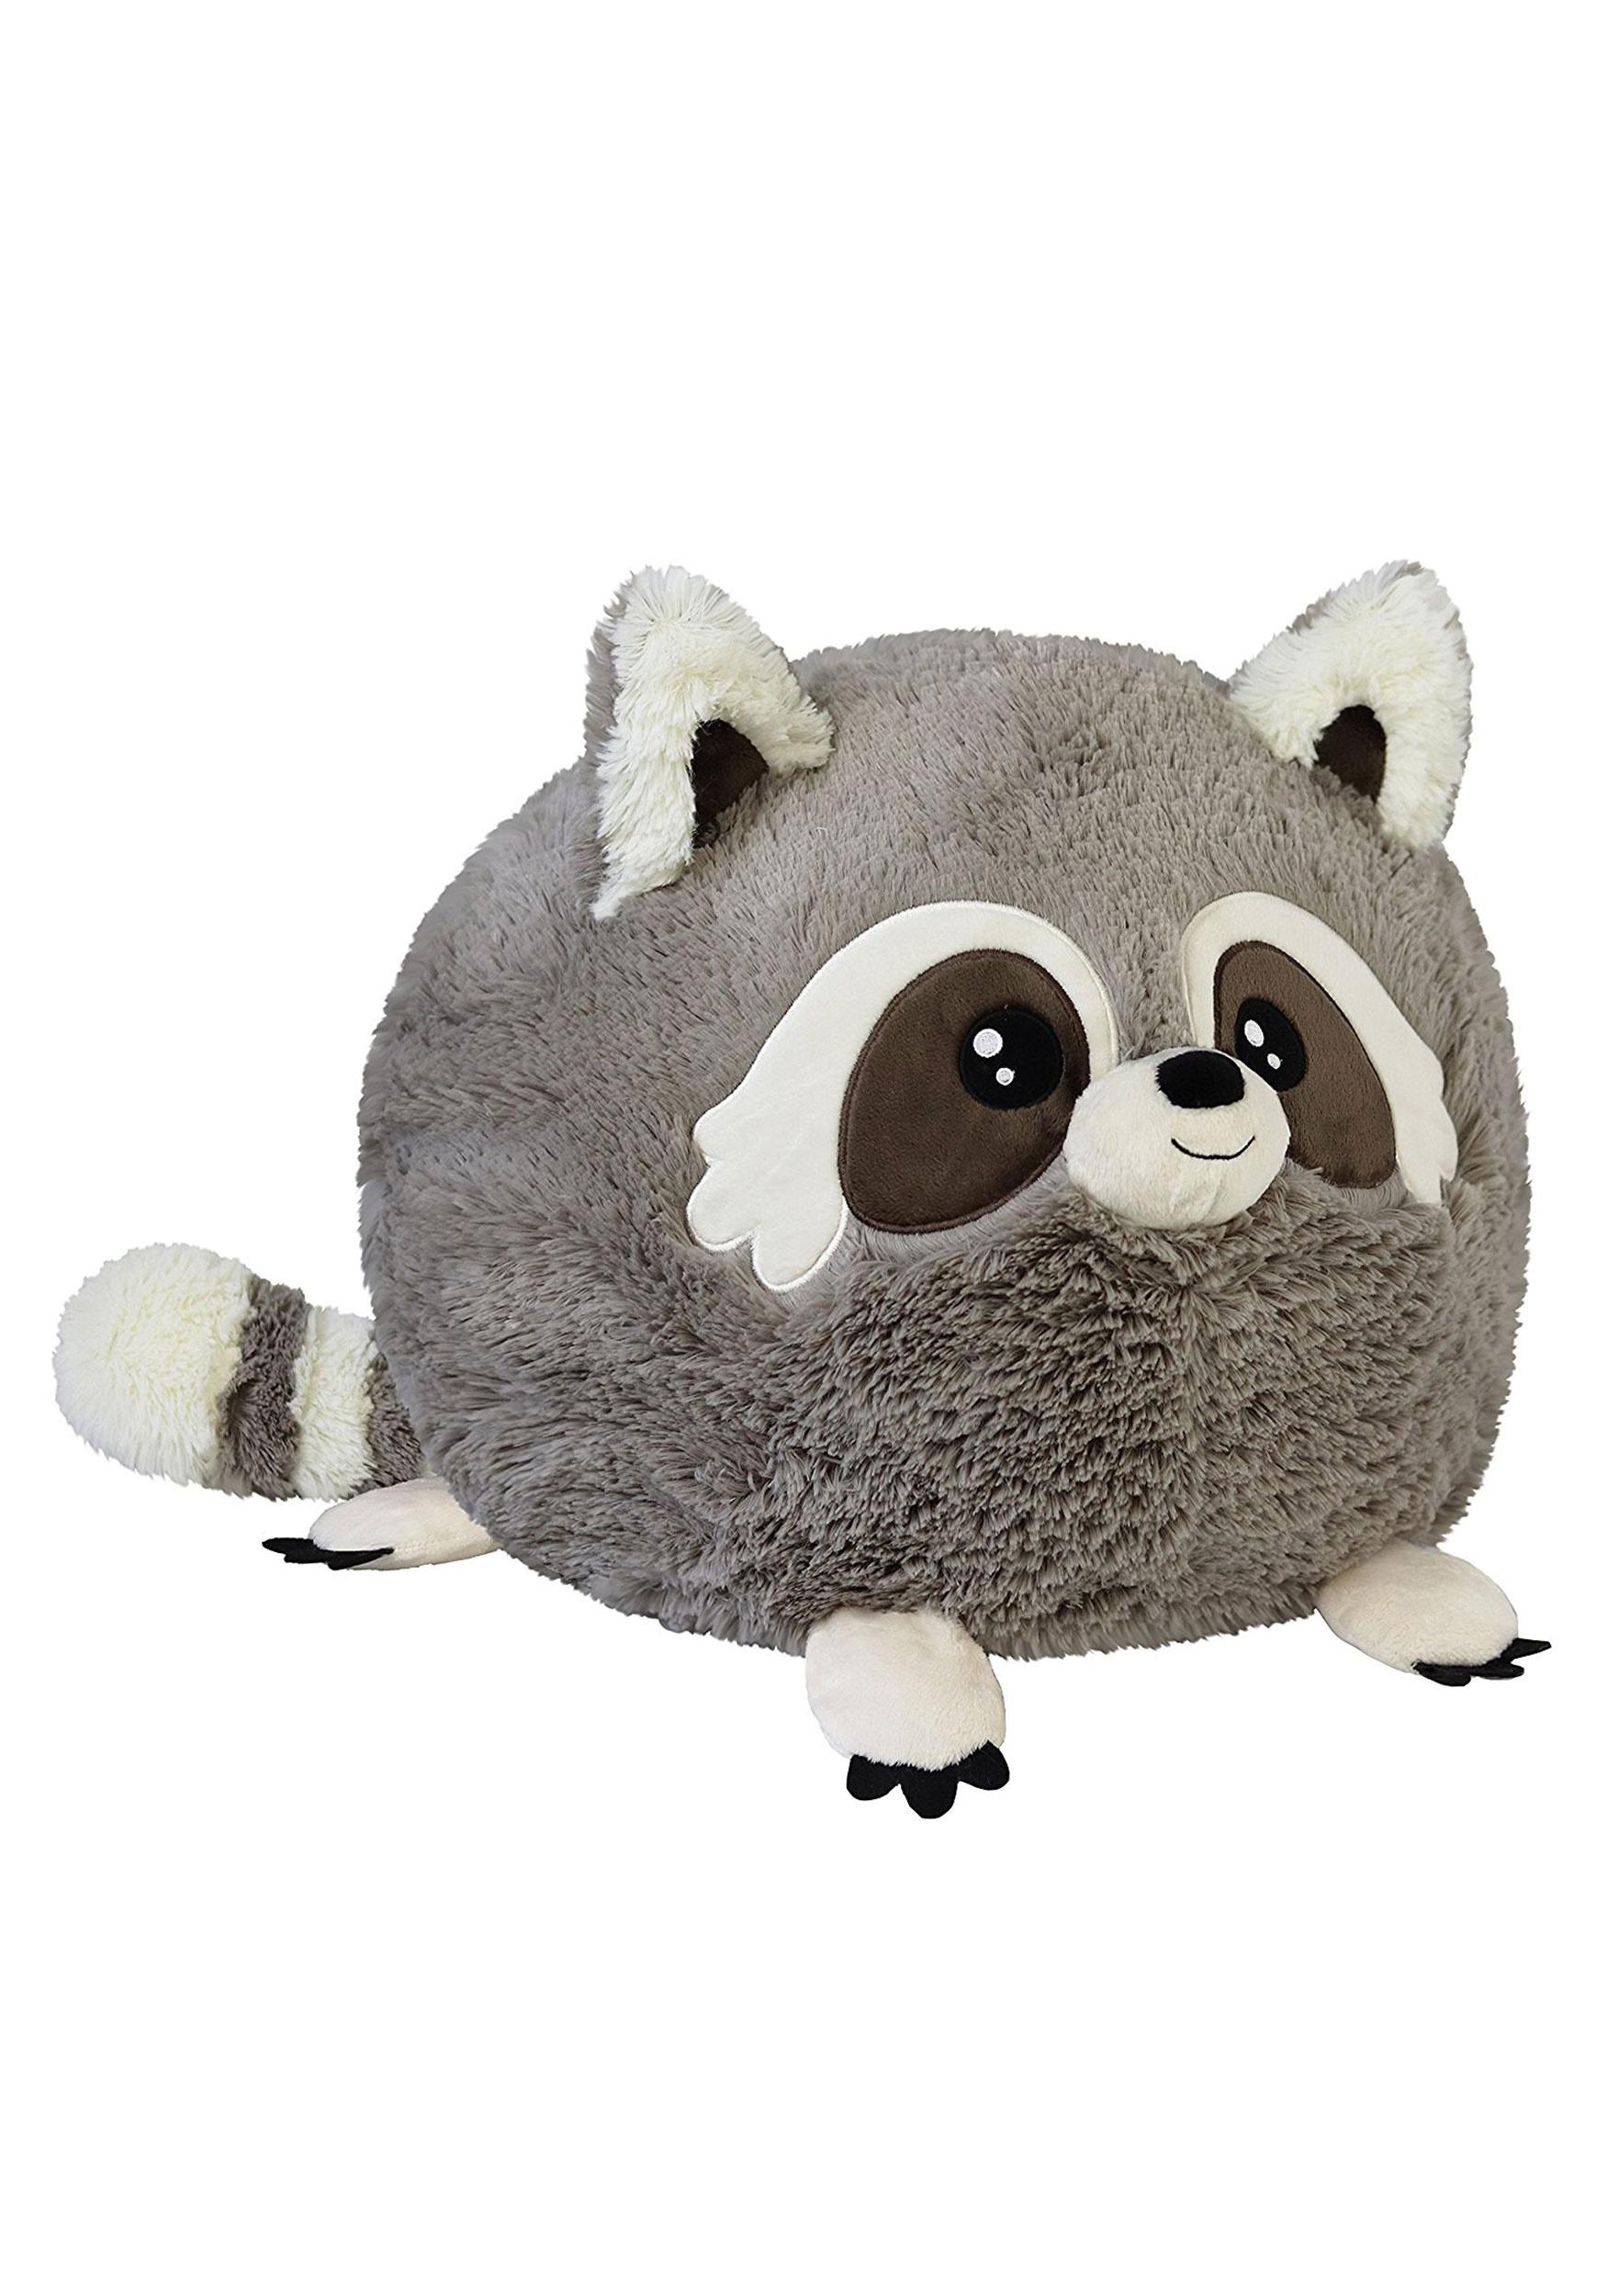 Squishable Baby Raccoon 15 Stuffed Figure Plush